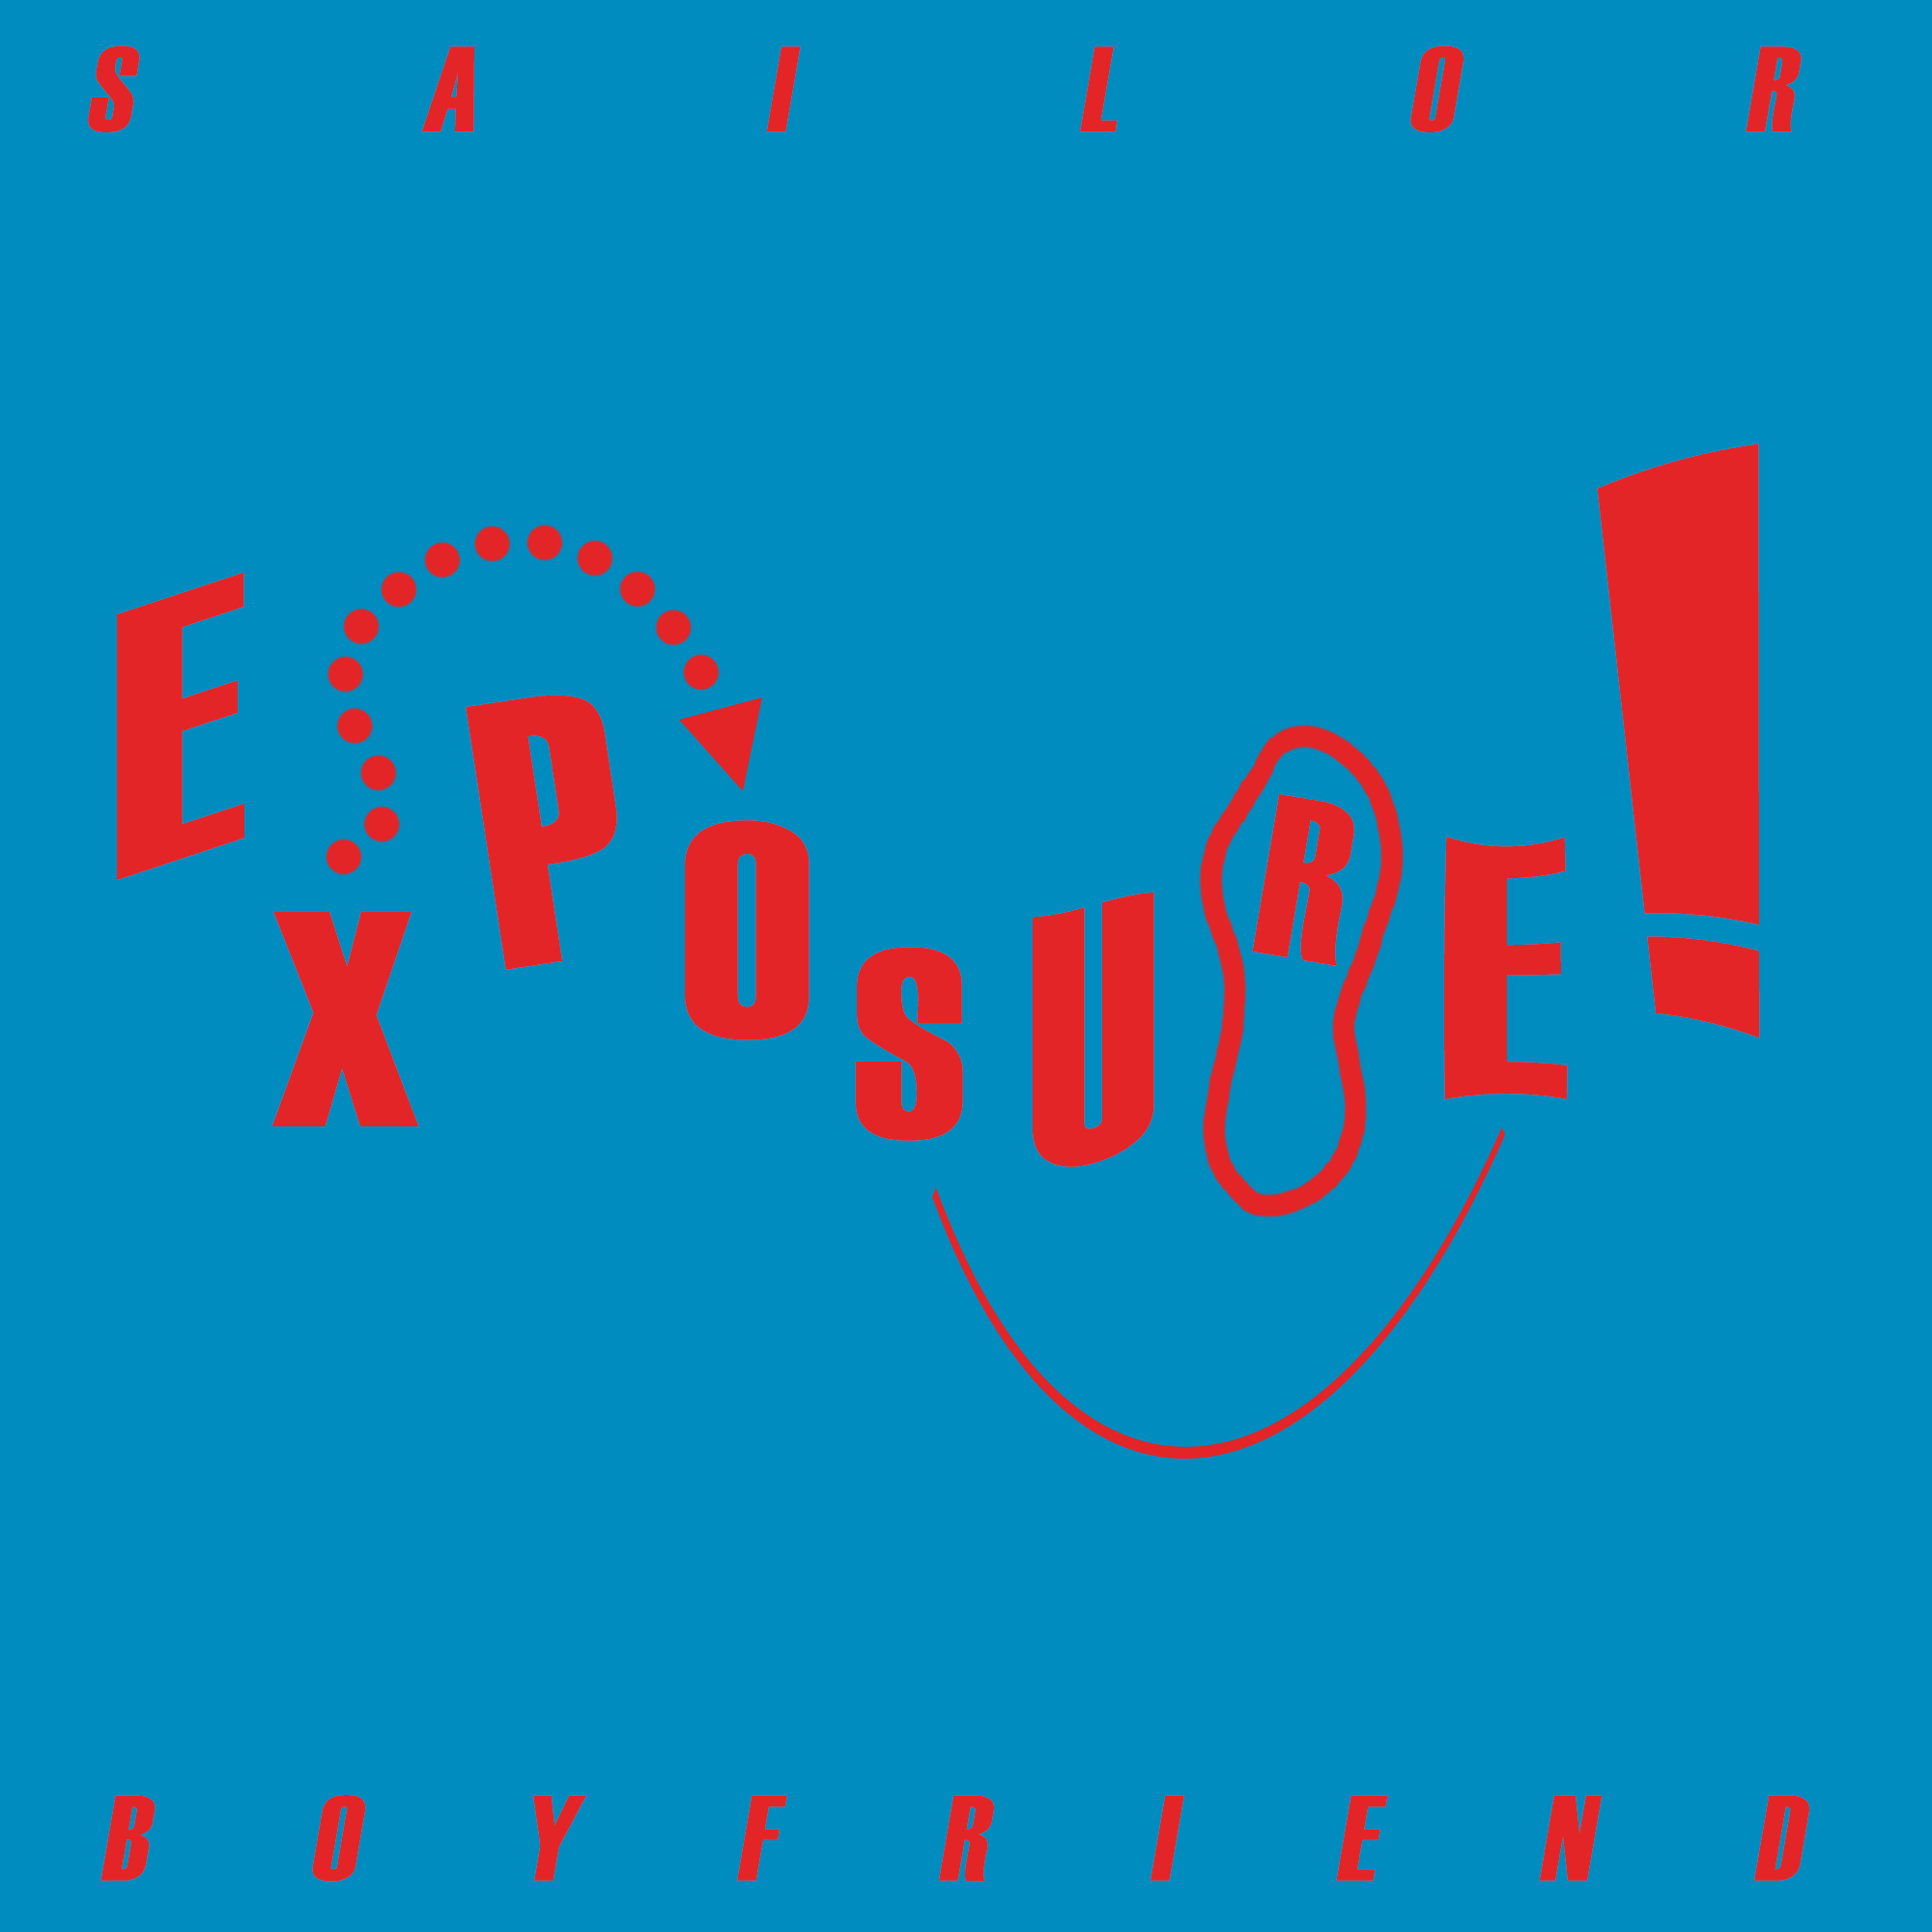 Sailor Boyfriend -   EXPOSURE!  Official Album Art    Designer : Andy Waldron